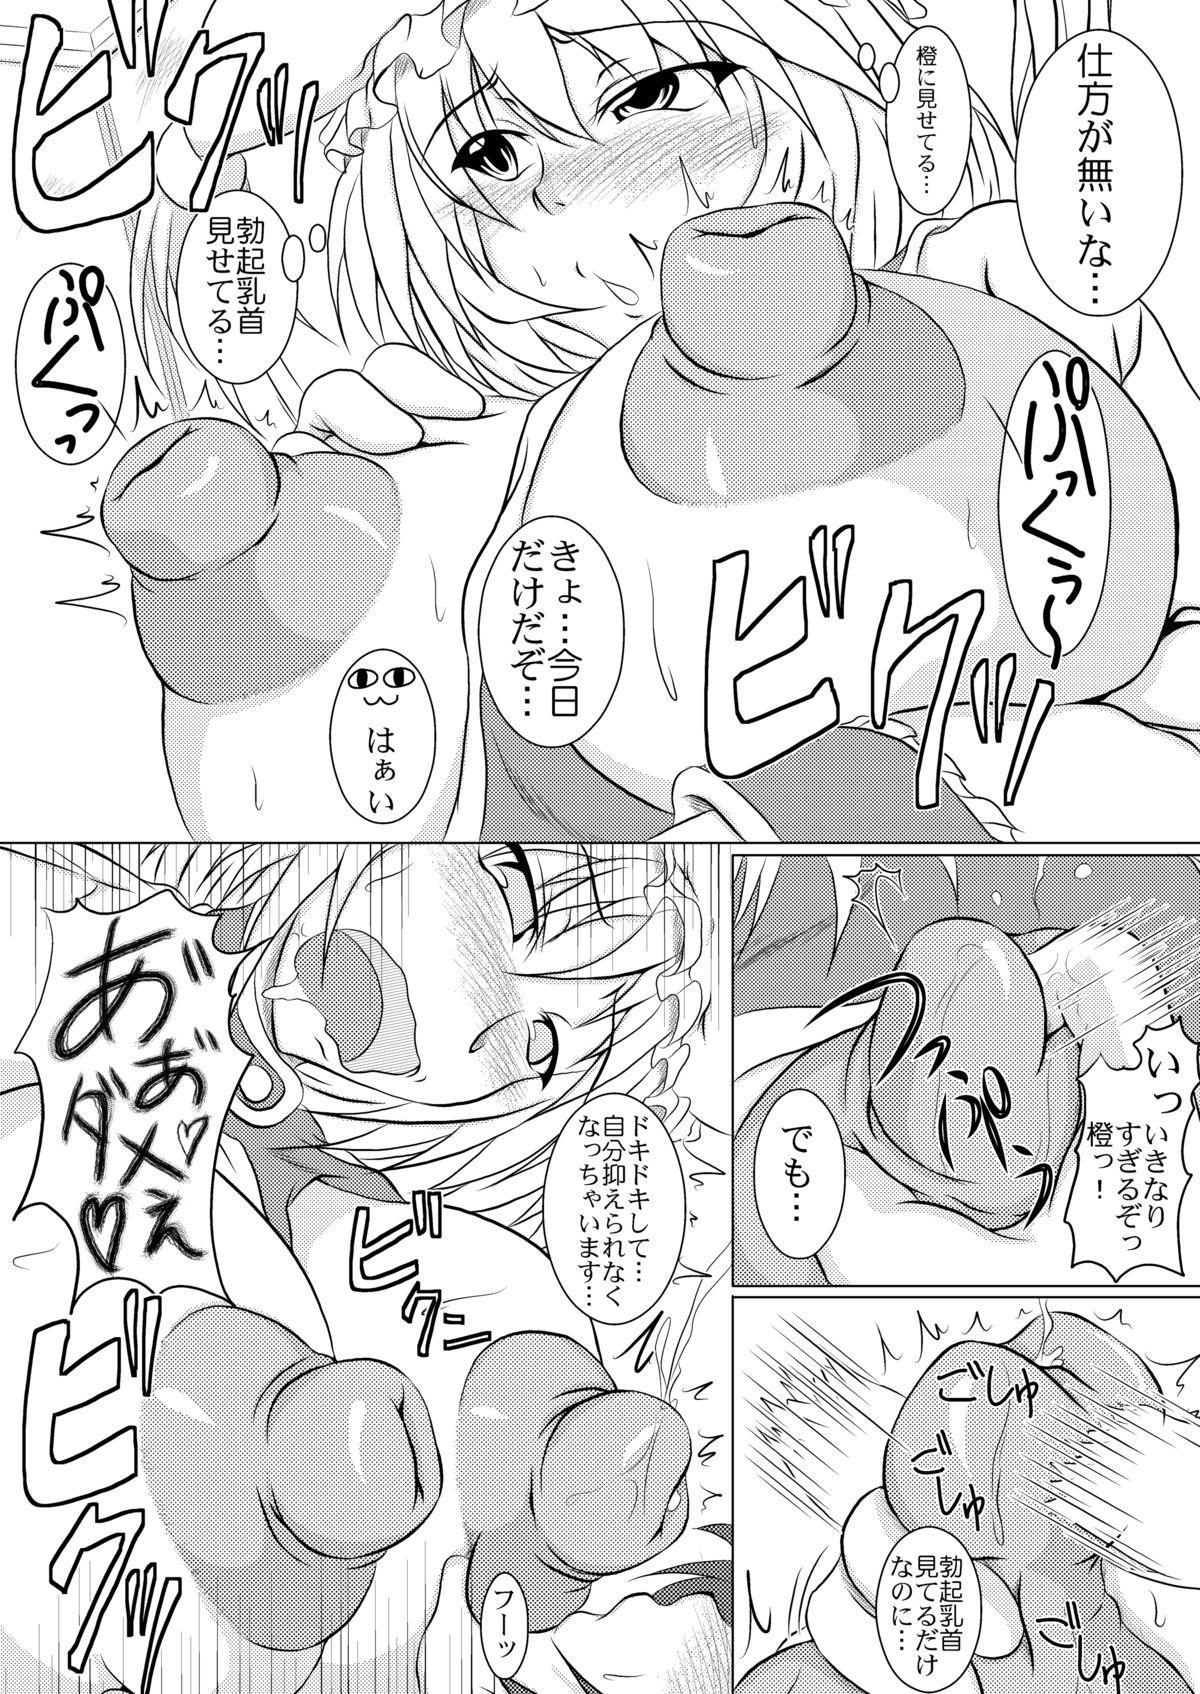 Ran-Chen 4